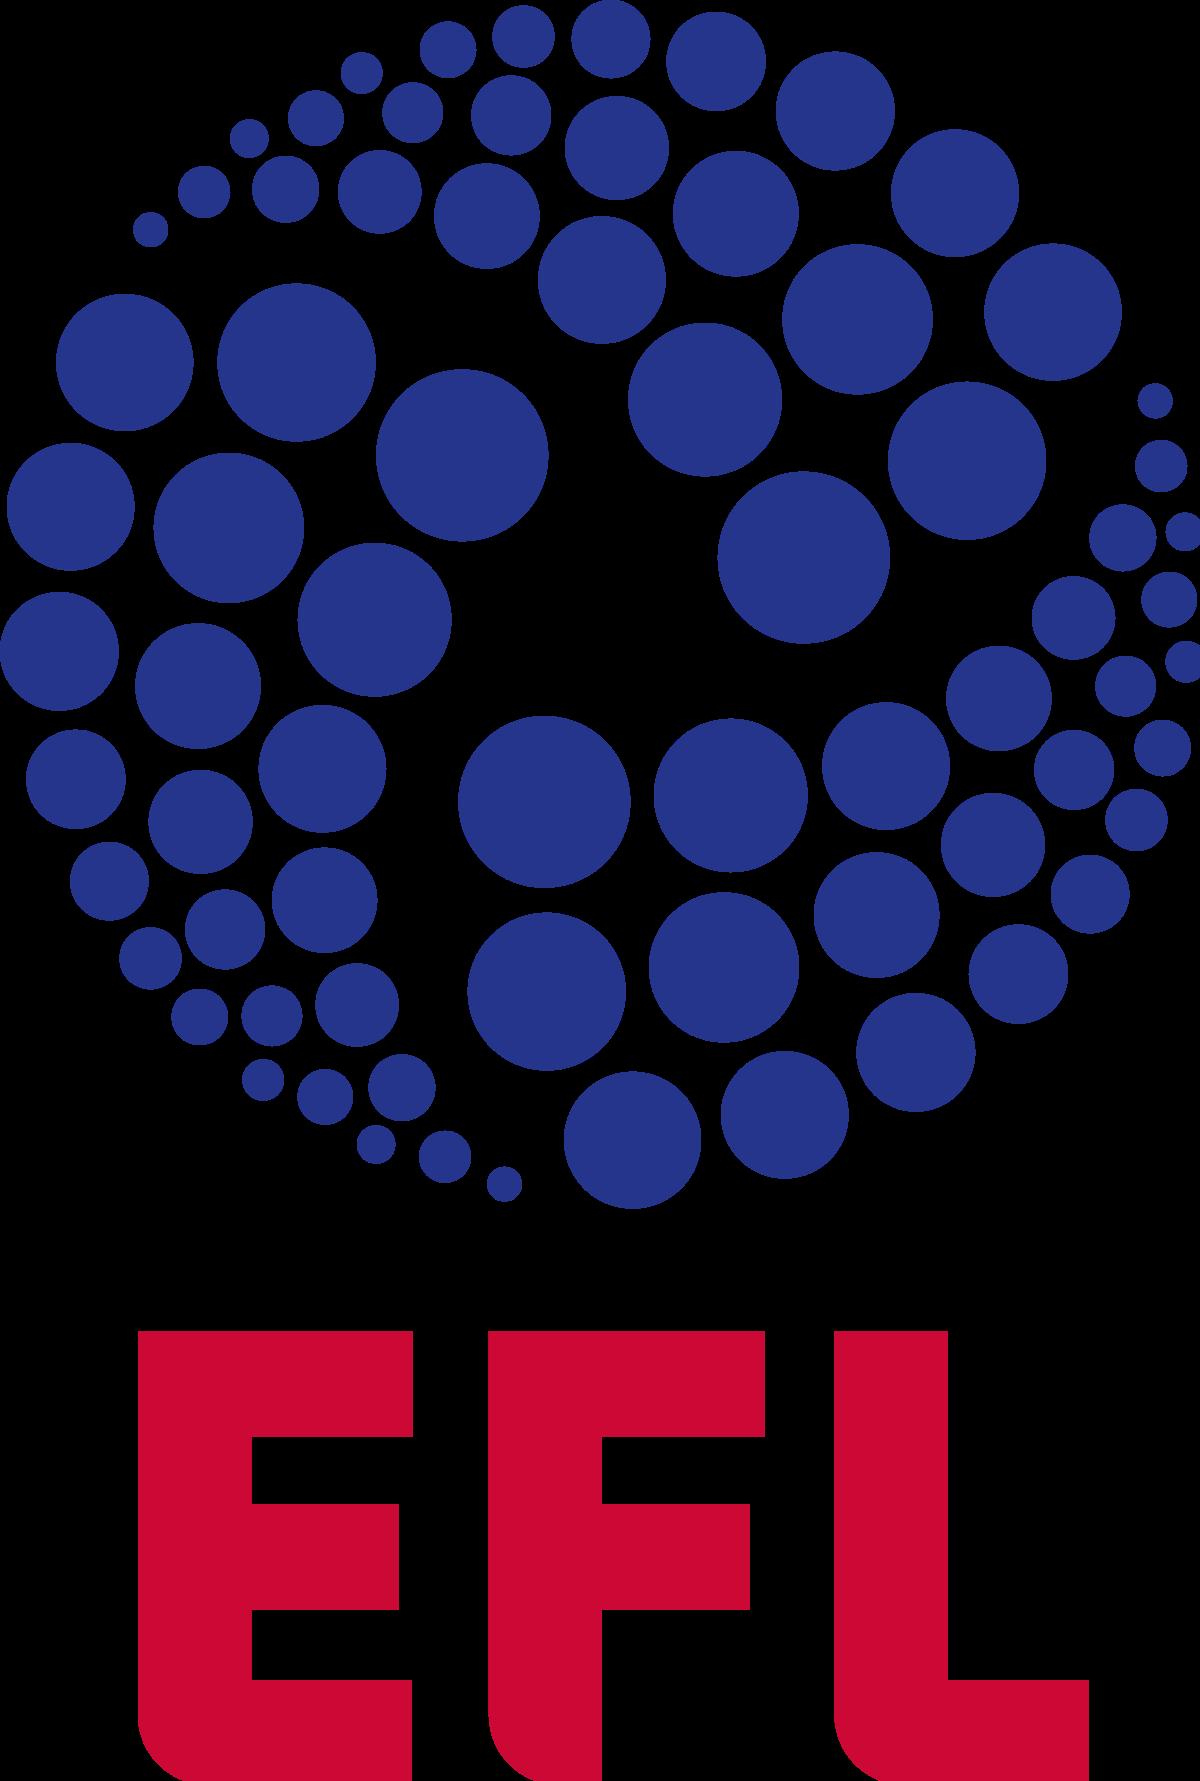 League collection premier english. Goal clipart football tournament